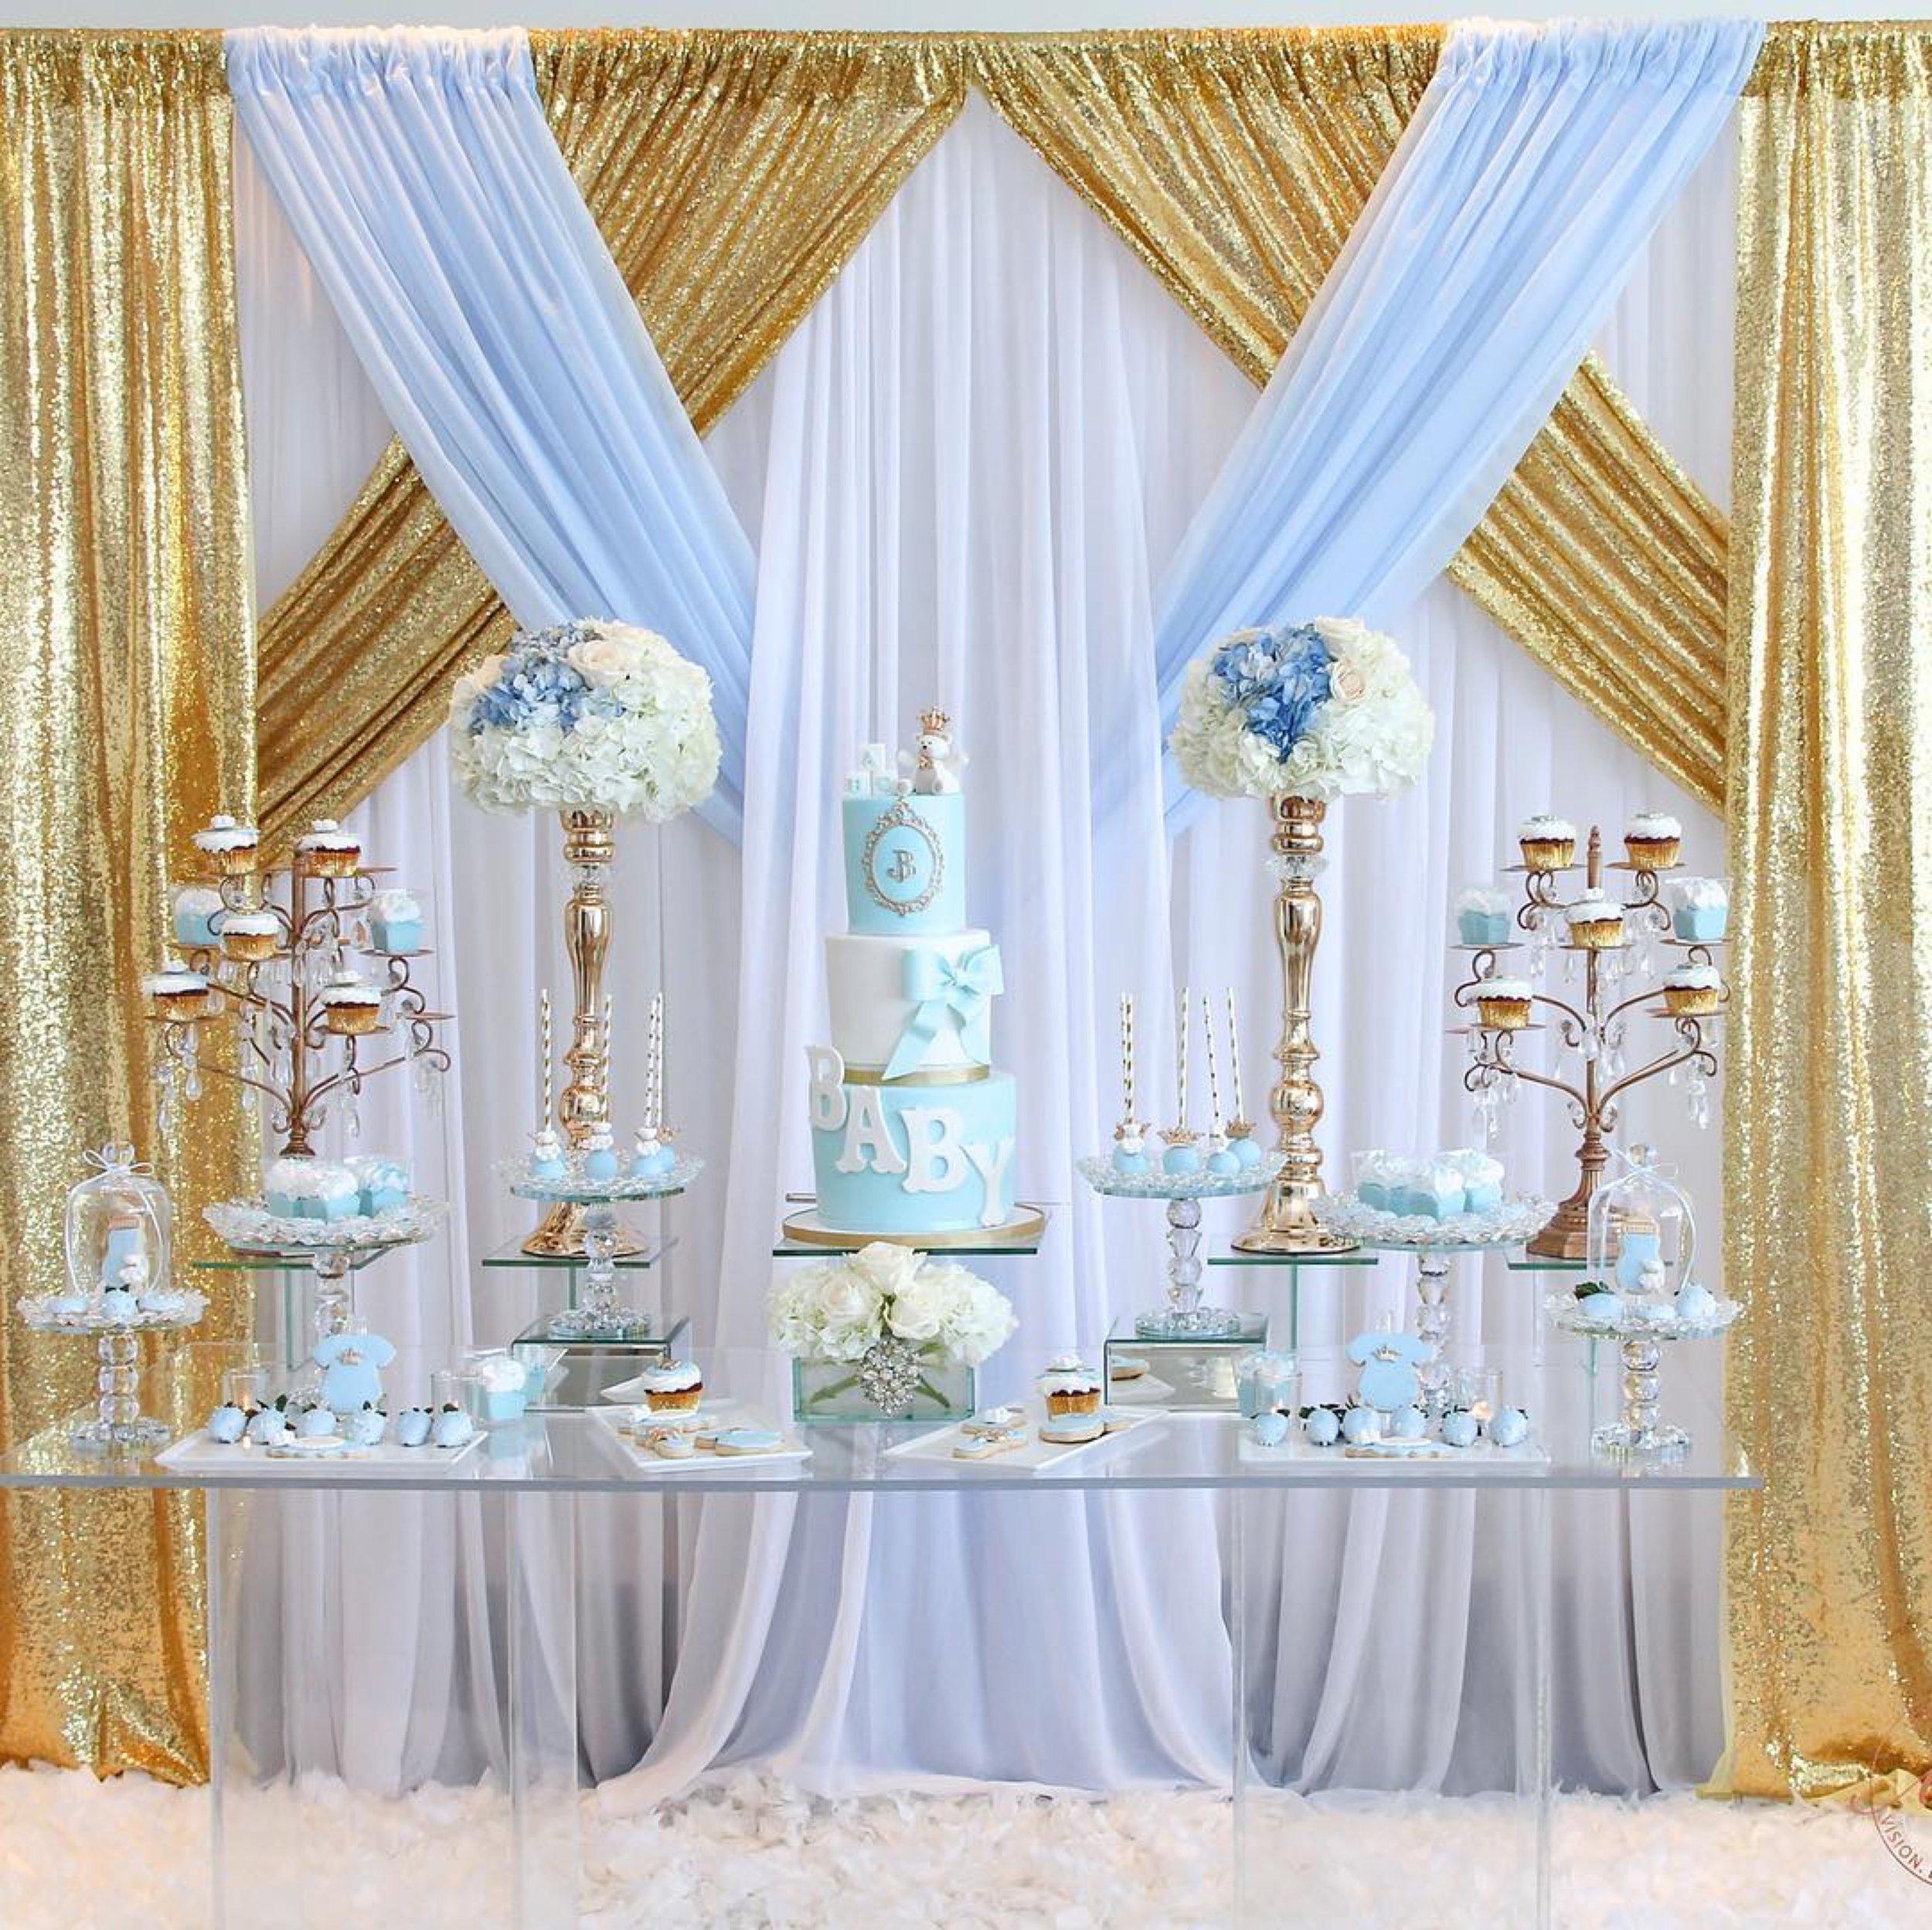 elegant-baby-shower-gold-chandelier-cupcake-stands.jpg